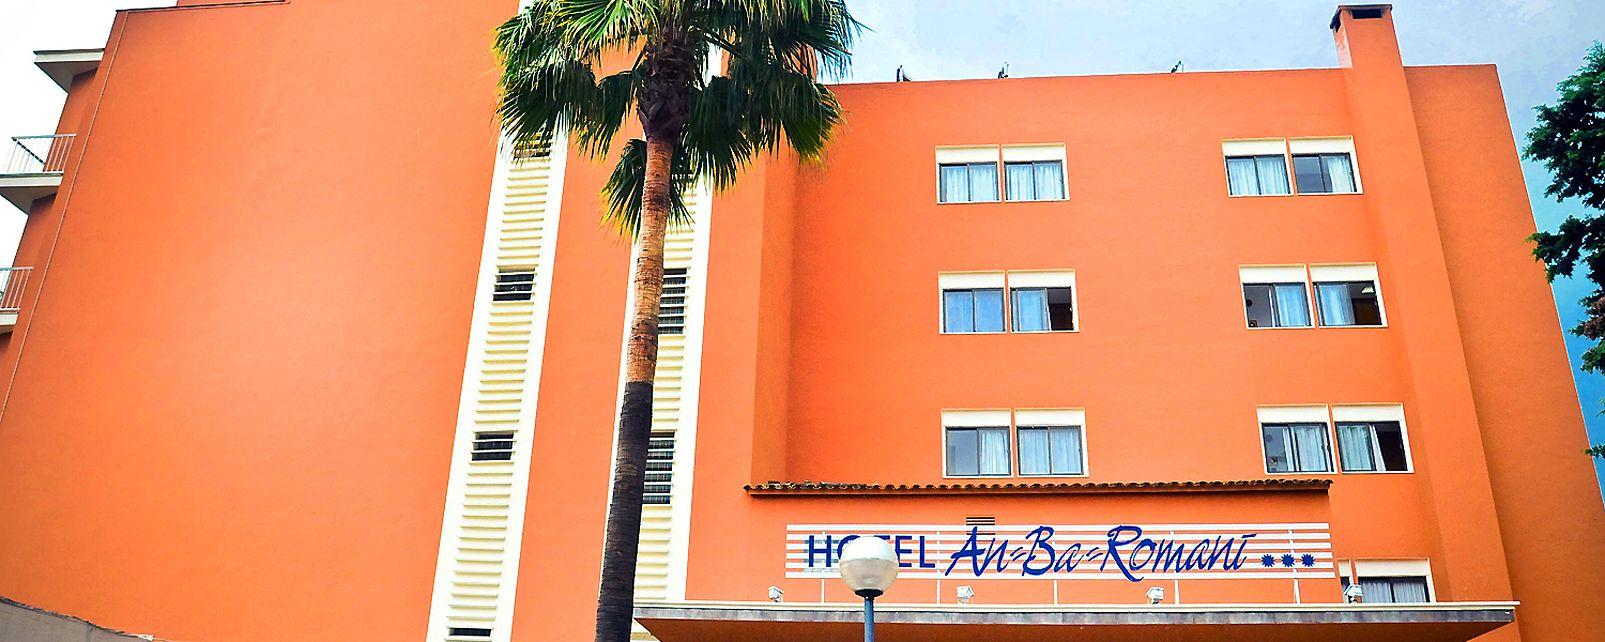 Hôtel Anba Romani